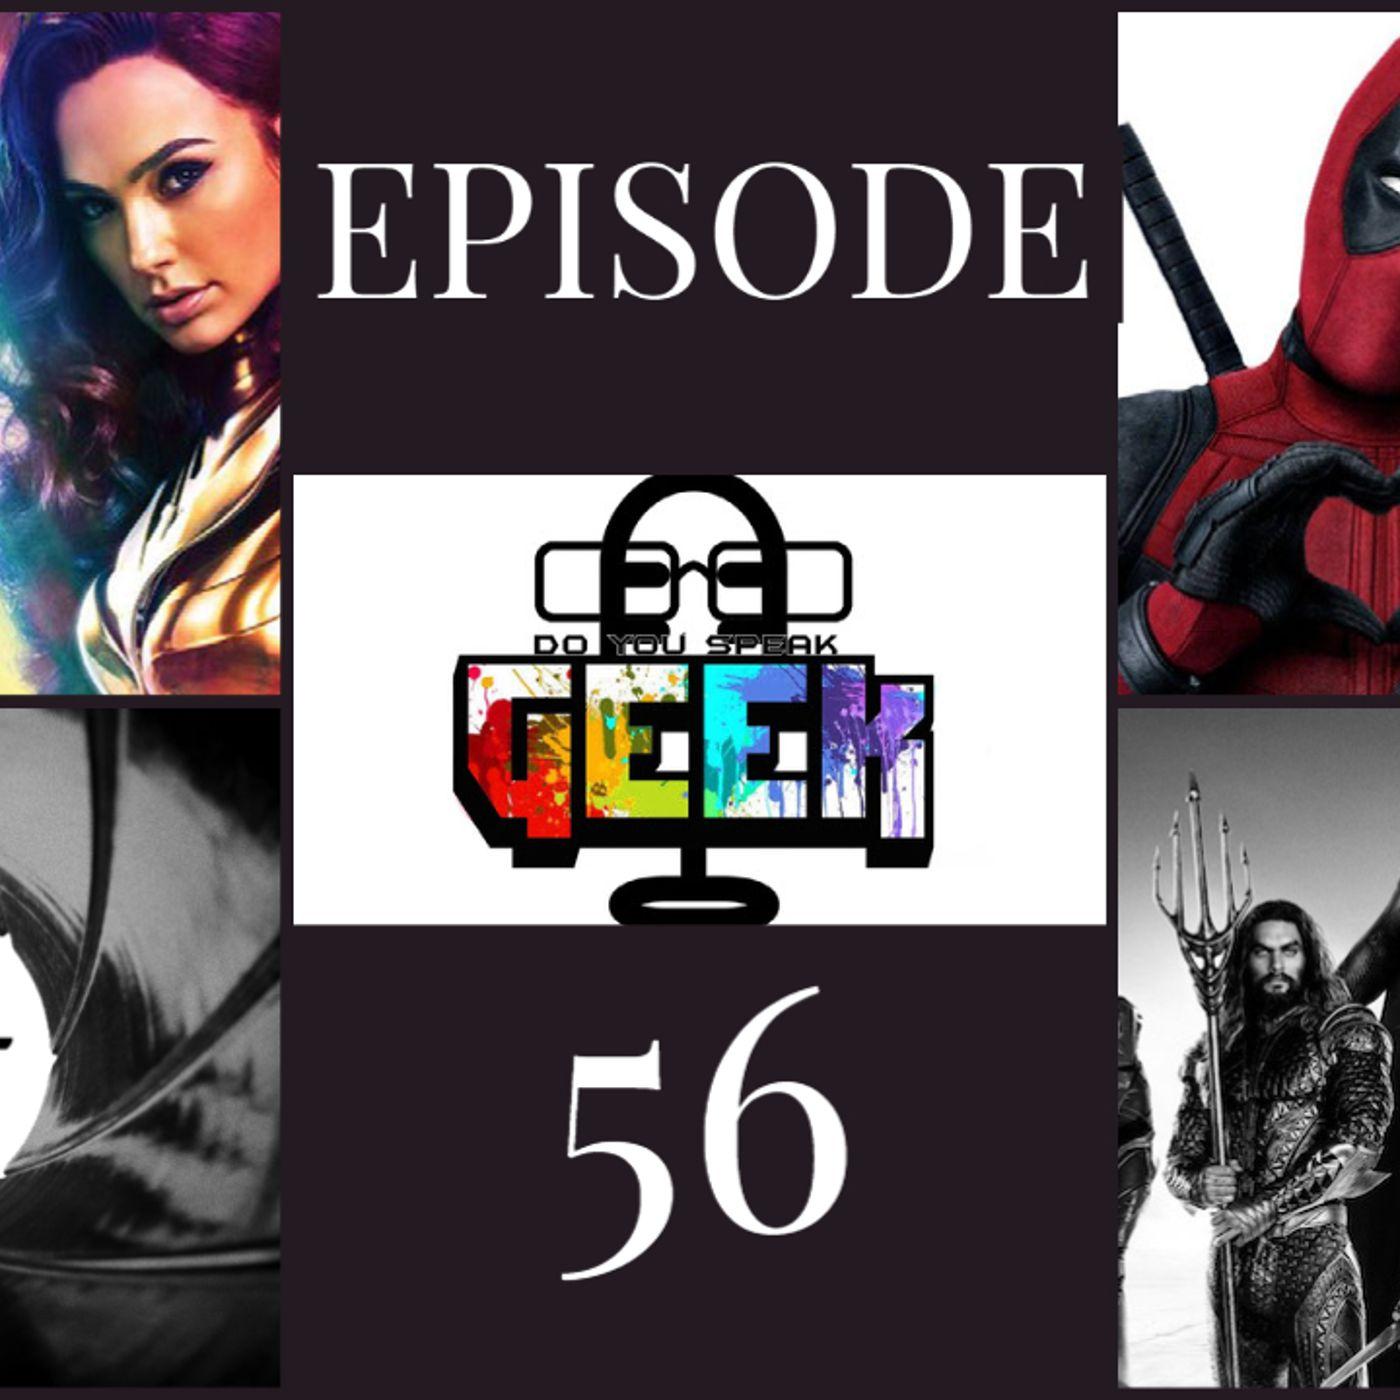 Episode 56 (Wonder Woman 1984, Black Lightning, Deadpool 3, Project 007, and more)